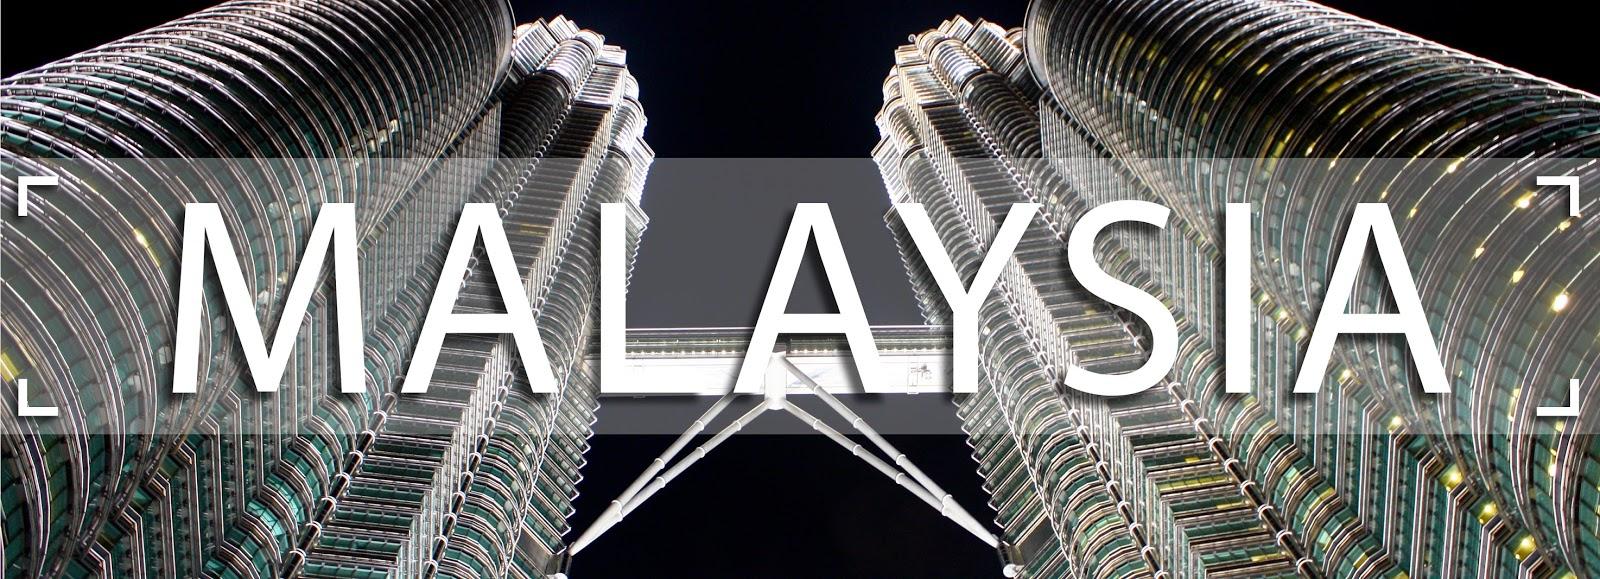 Destination: Malaysia